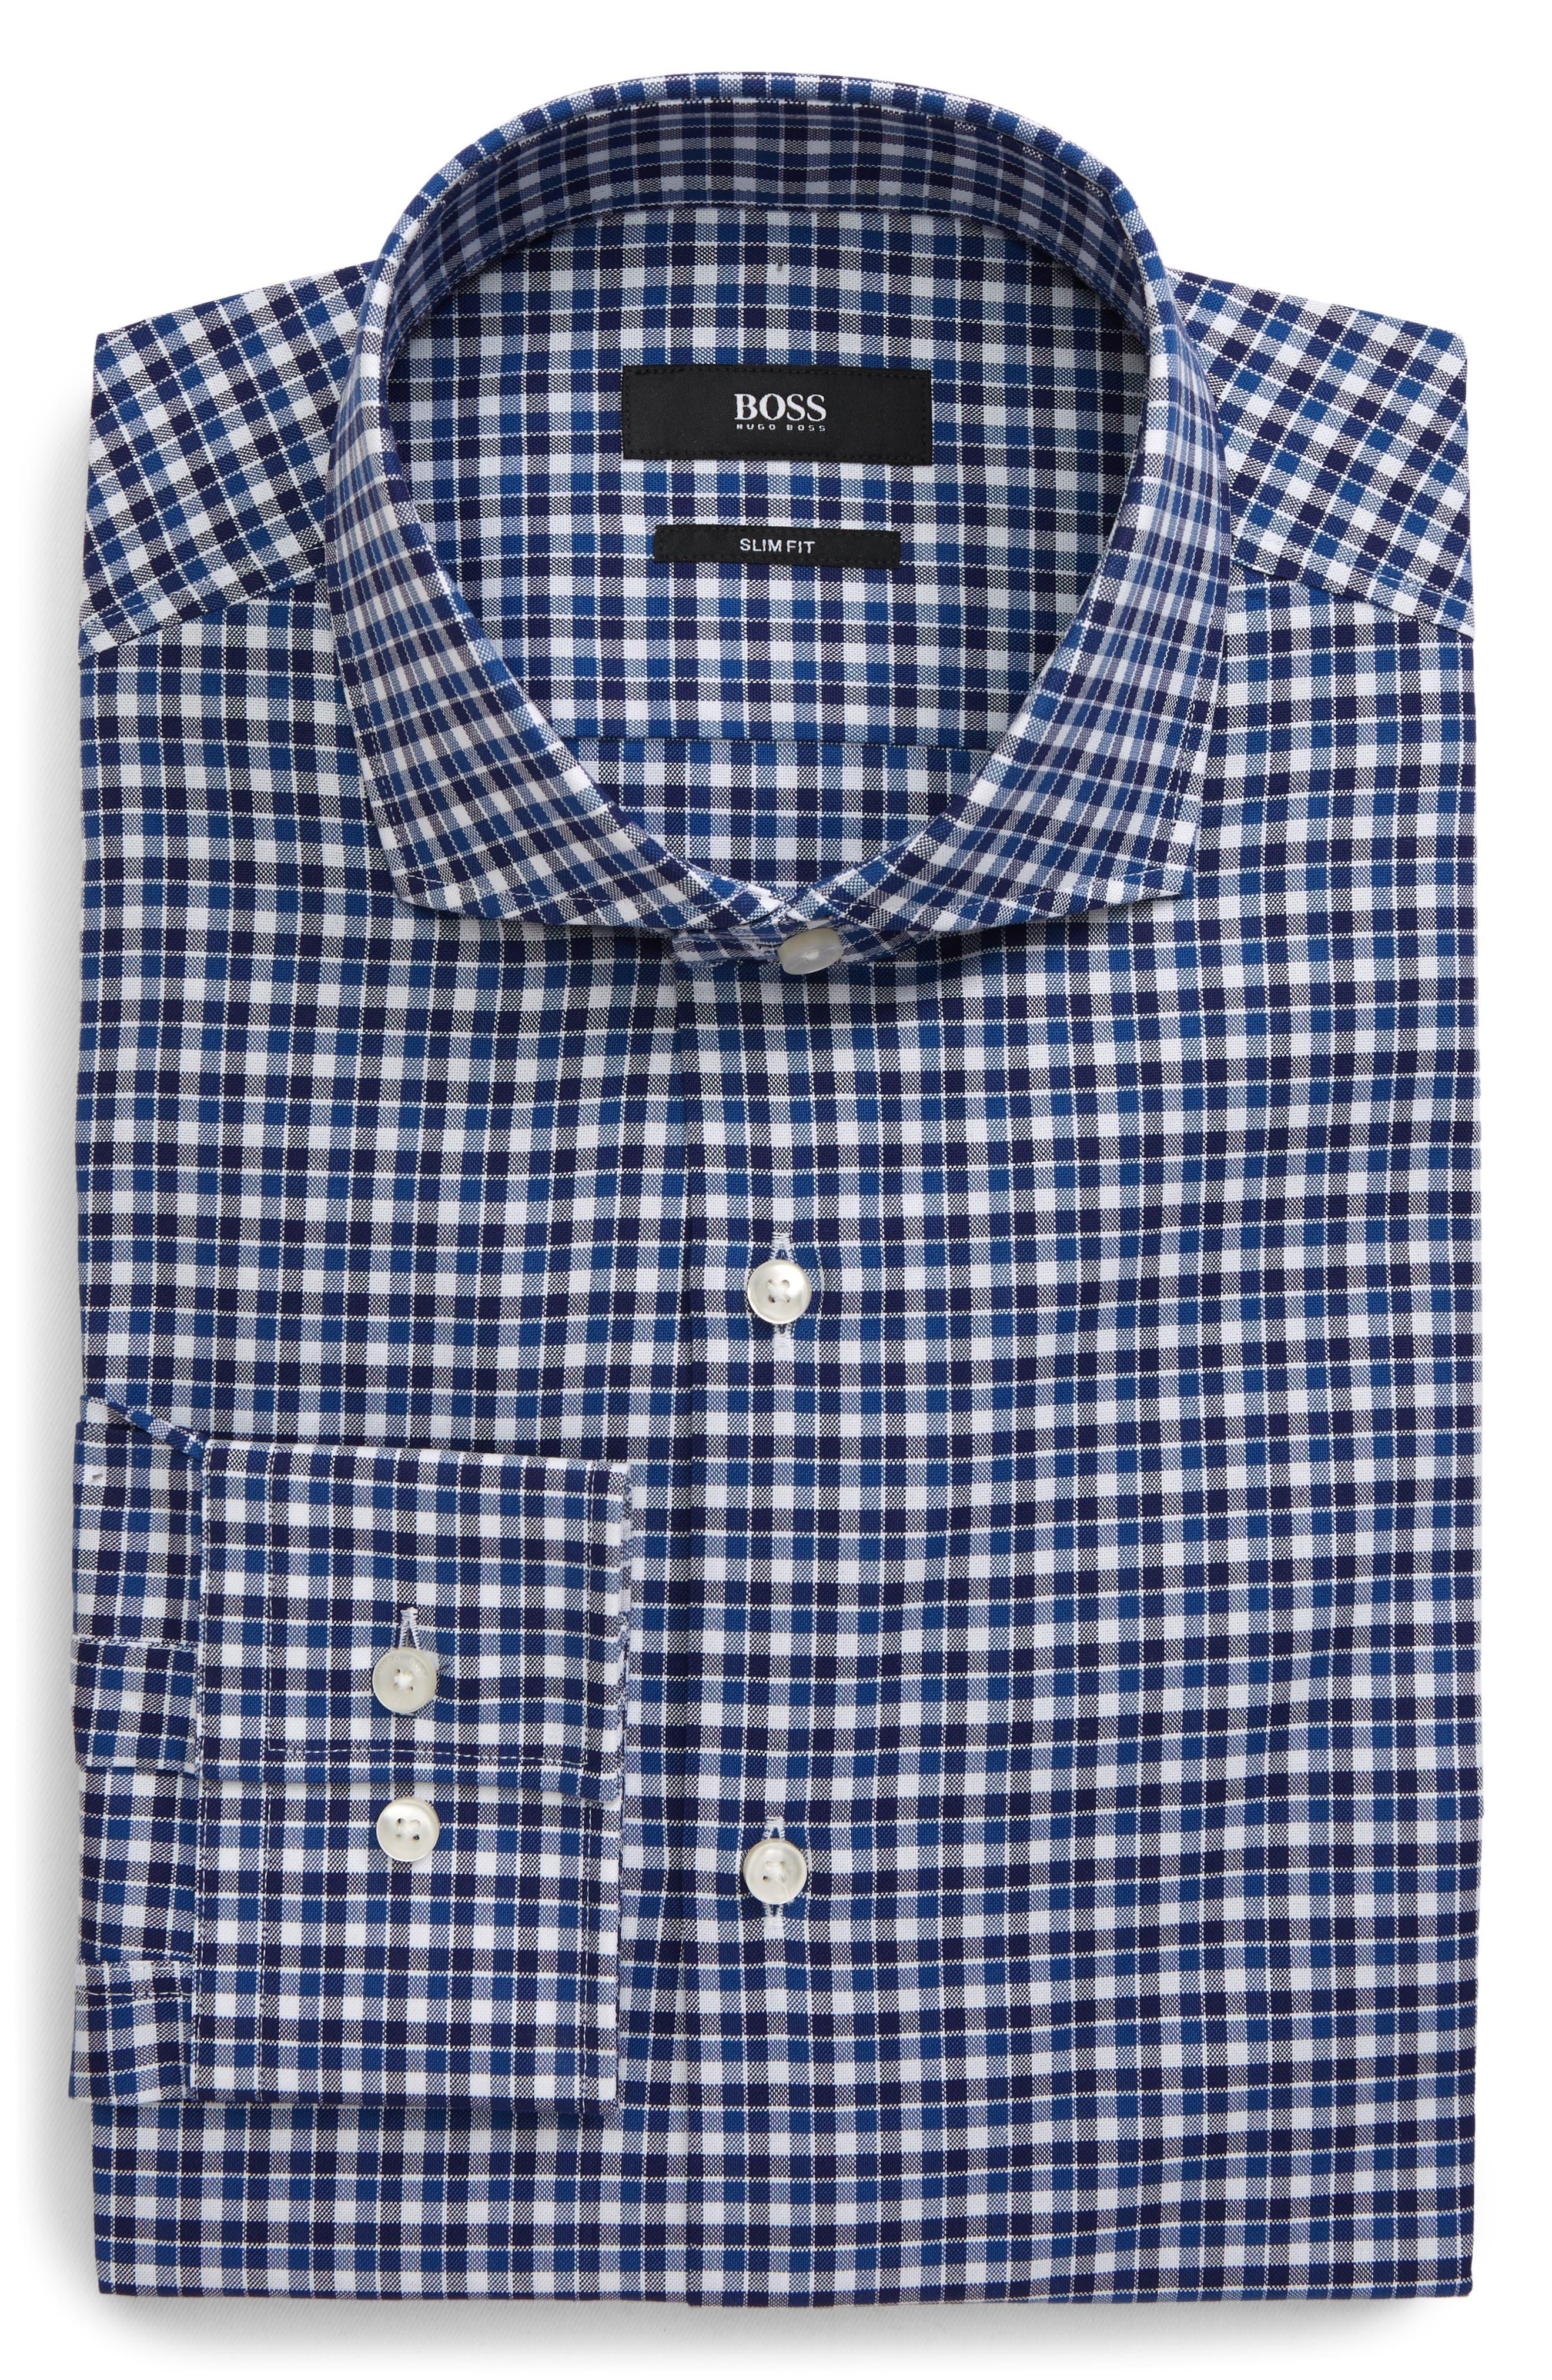 Image of BOSS Plaid Slim Fit Dress Shirt